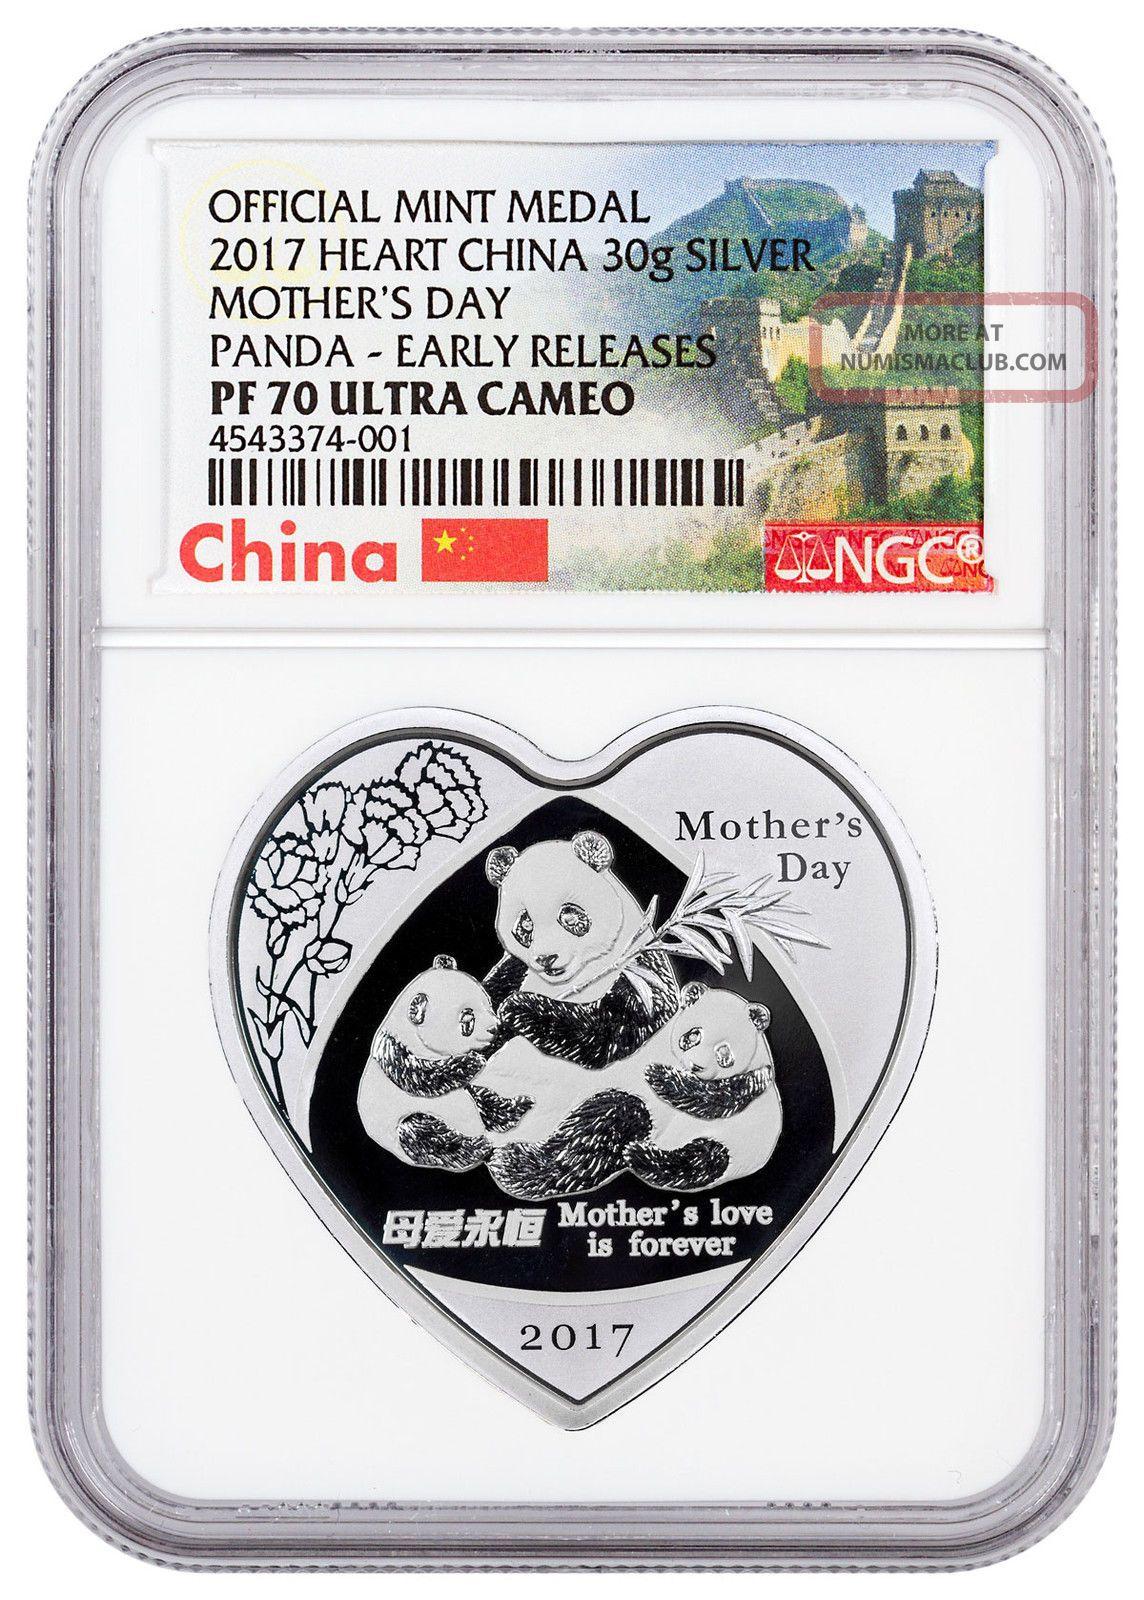 2017 China Mothers Day Heart - Shaped Panda 30g Silver Ngc Pf70 Uc Er Sku47065 Exonumia photo